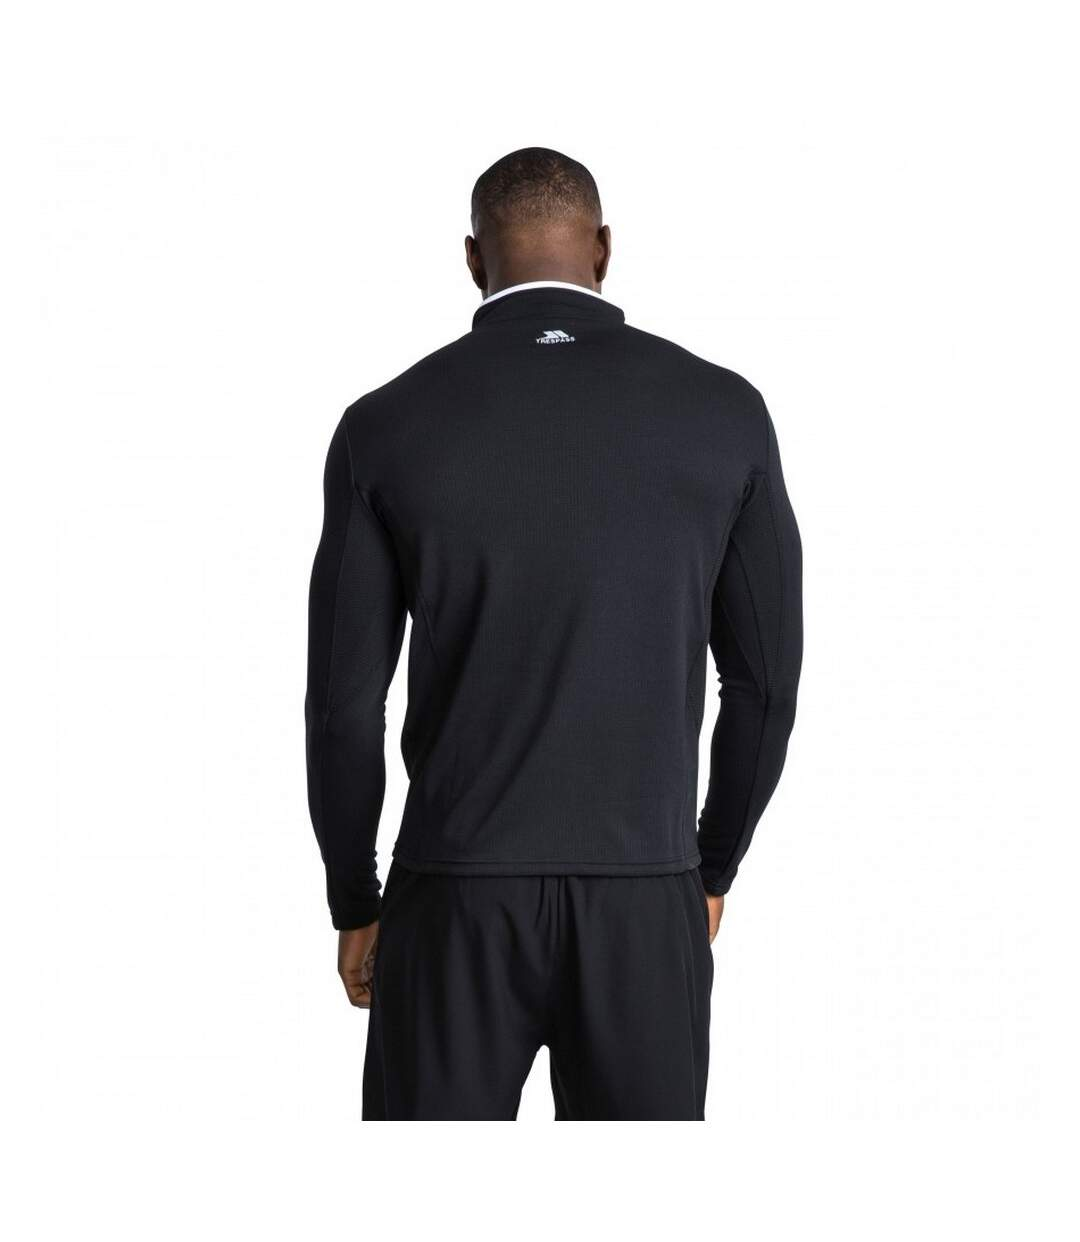 Trespass Mens Ronson Quick Dry Long Sleeve Active Top (Black) - UTTP3208